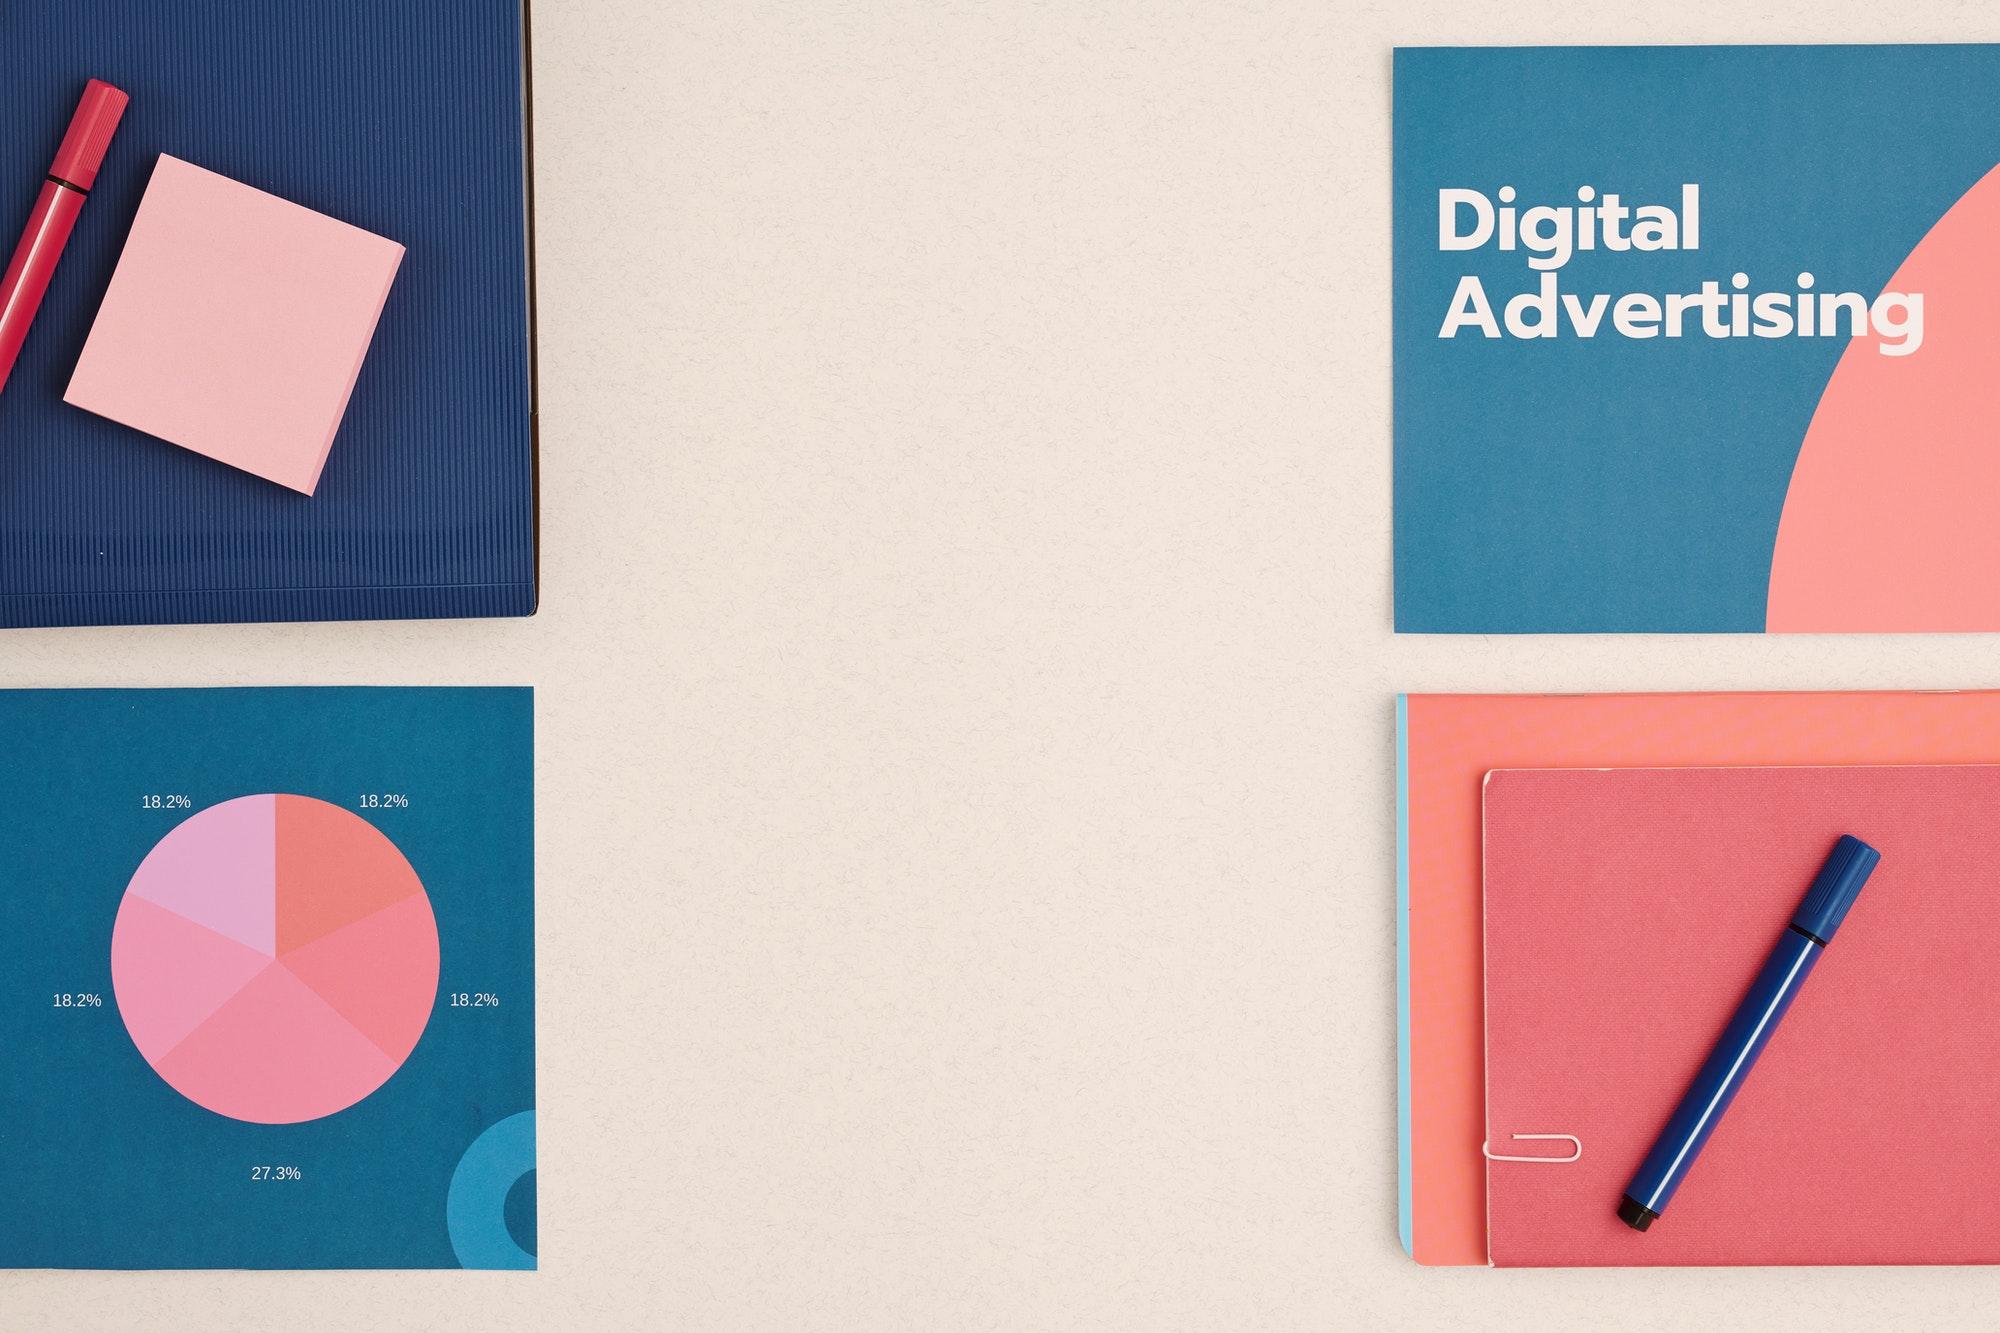 Pay-per-click digital advertising